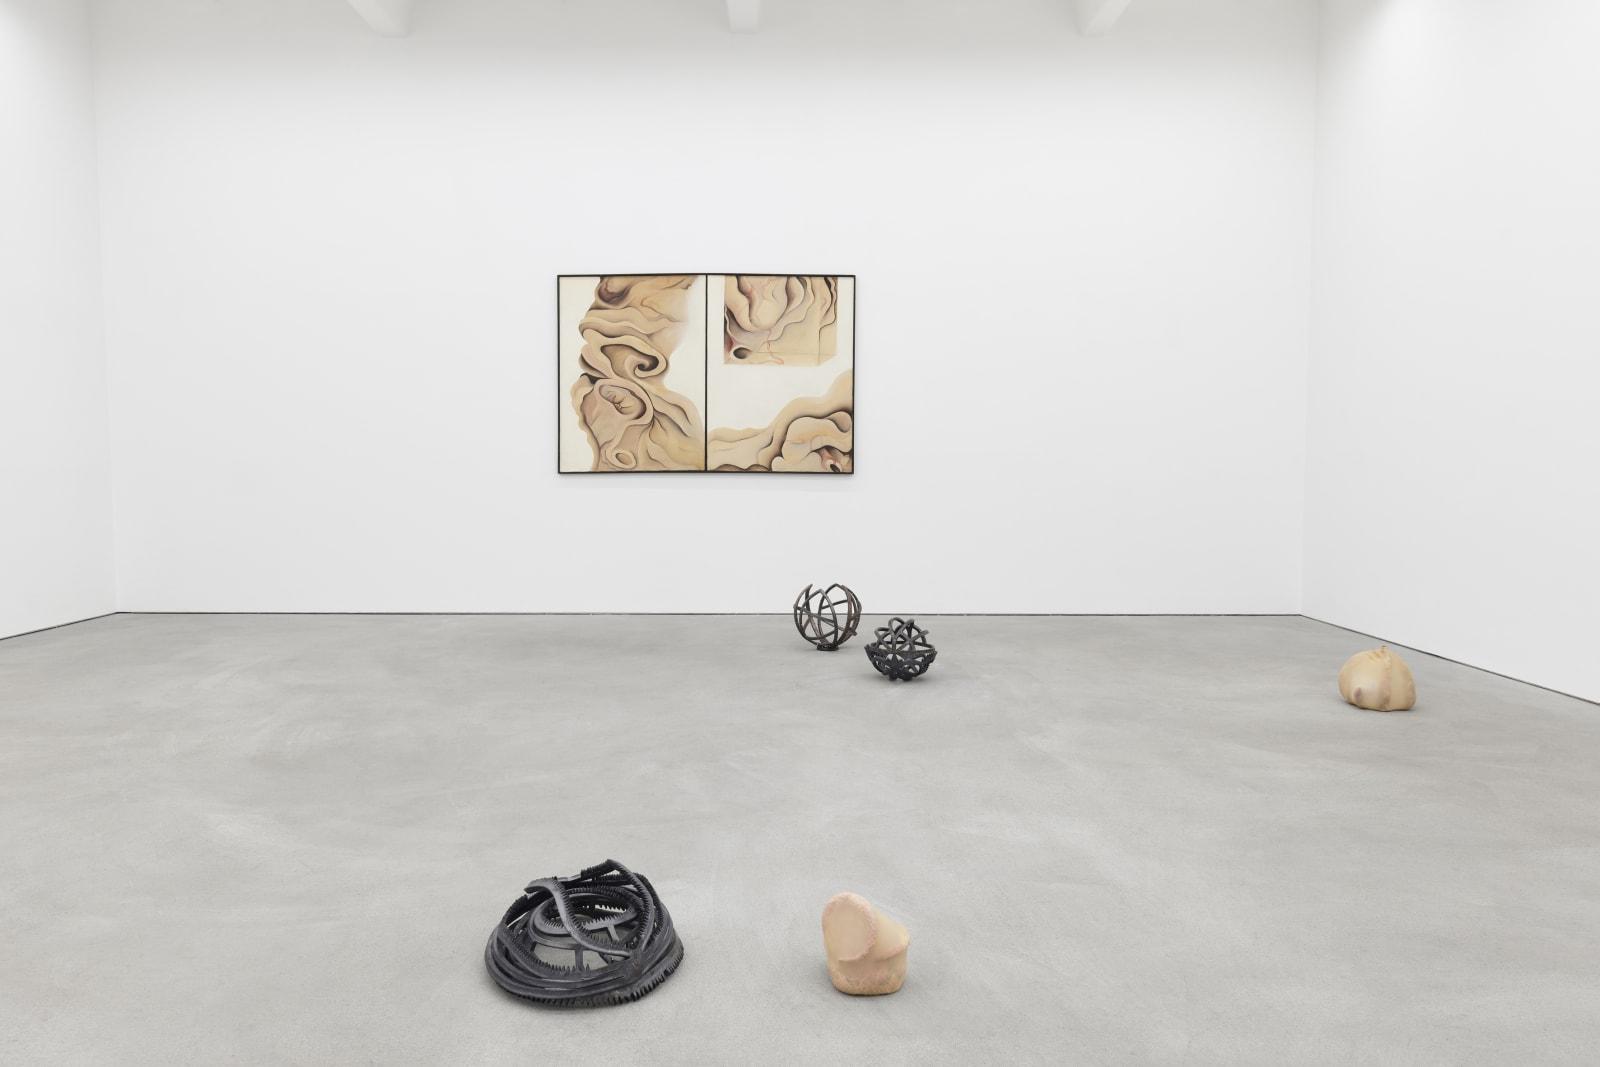 MIRIAM MANIA MUNSKY, HANNA MARIA HAMMARI exhibition view, Liminal States, Kraupa-Tuskany Zeidler, Berlin 2019-2020